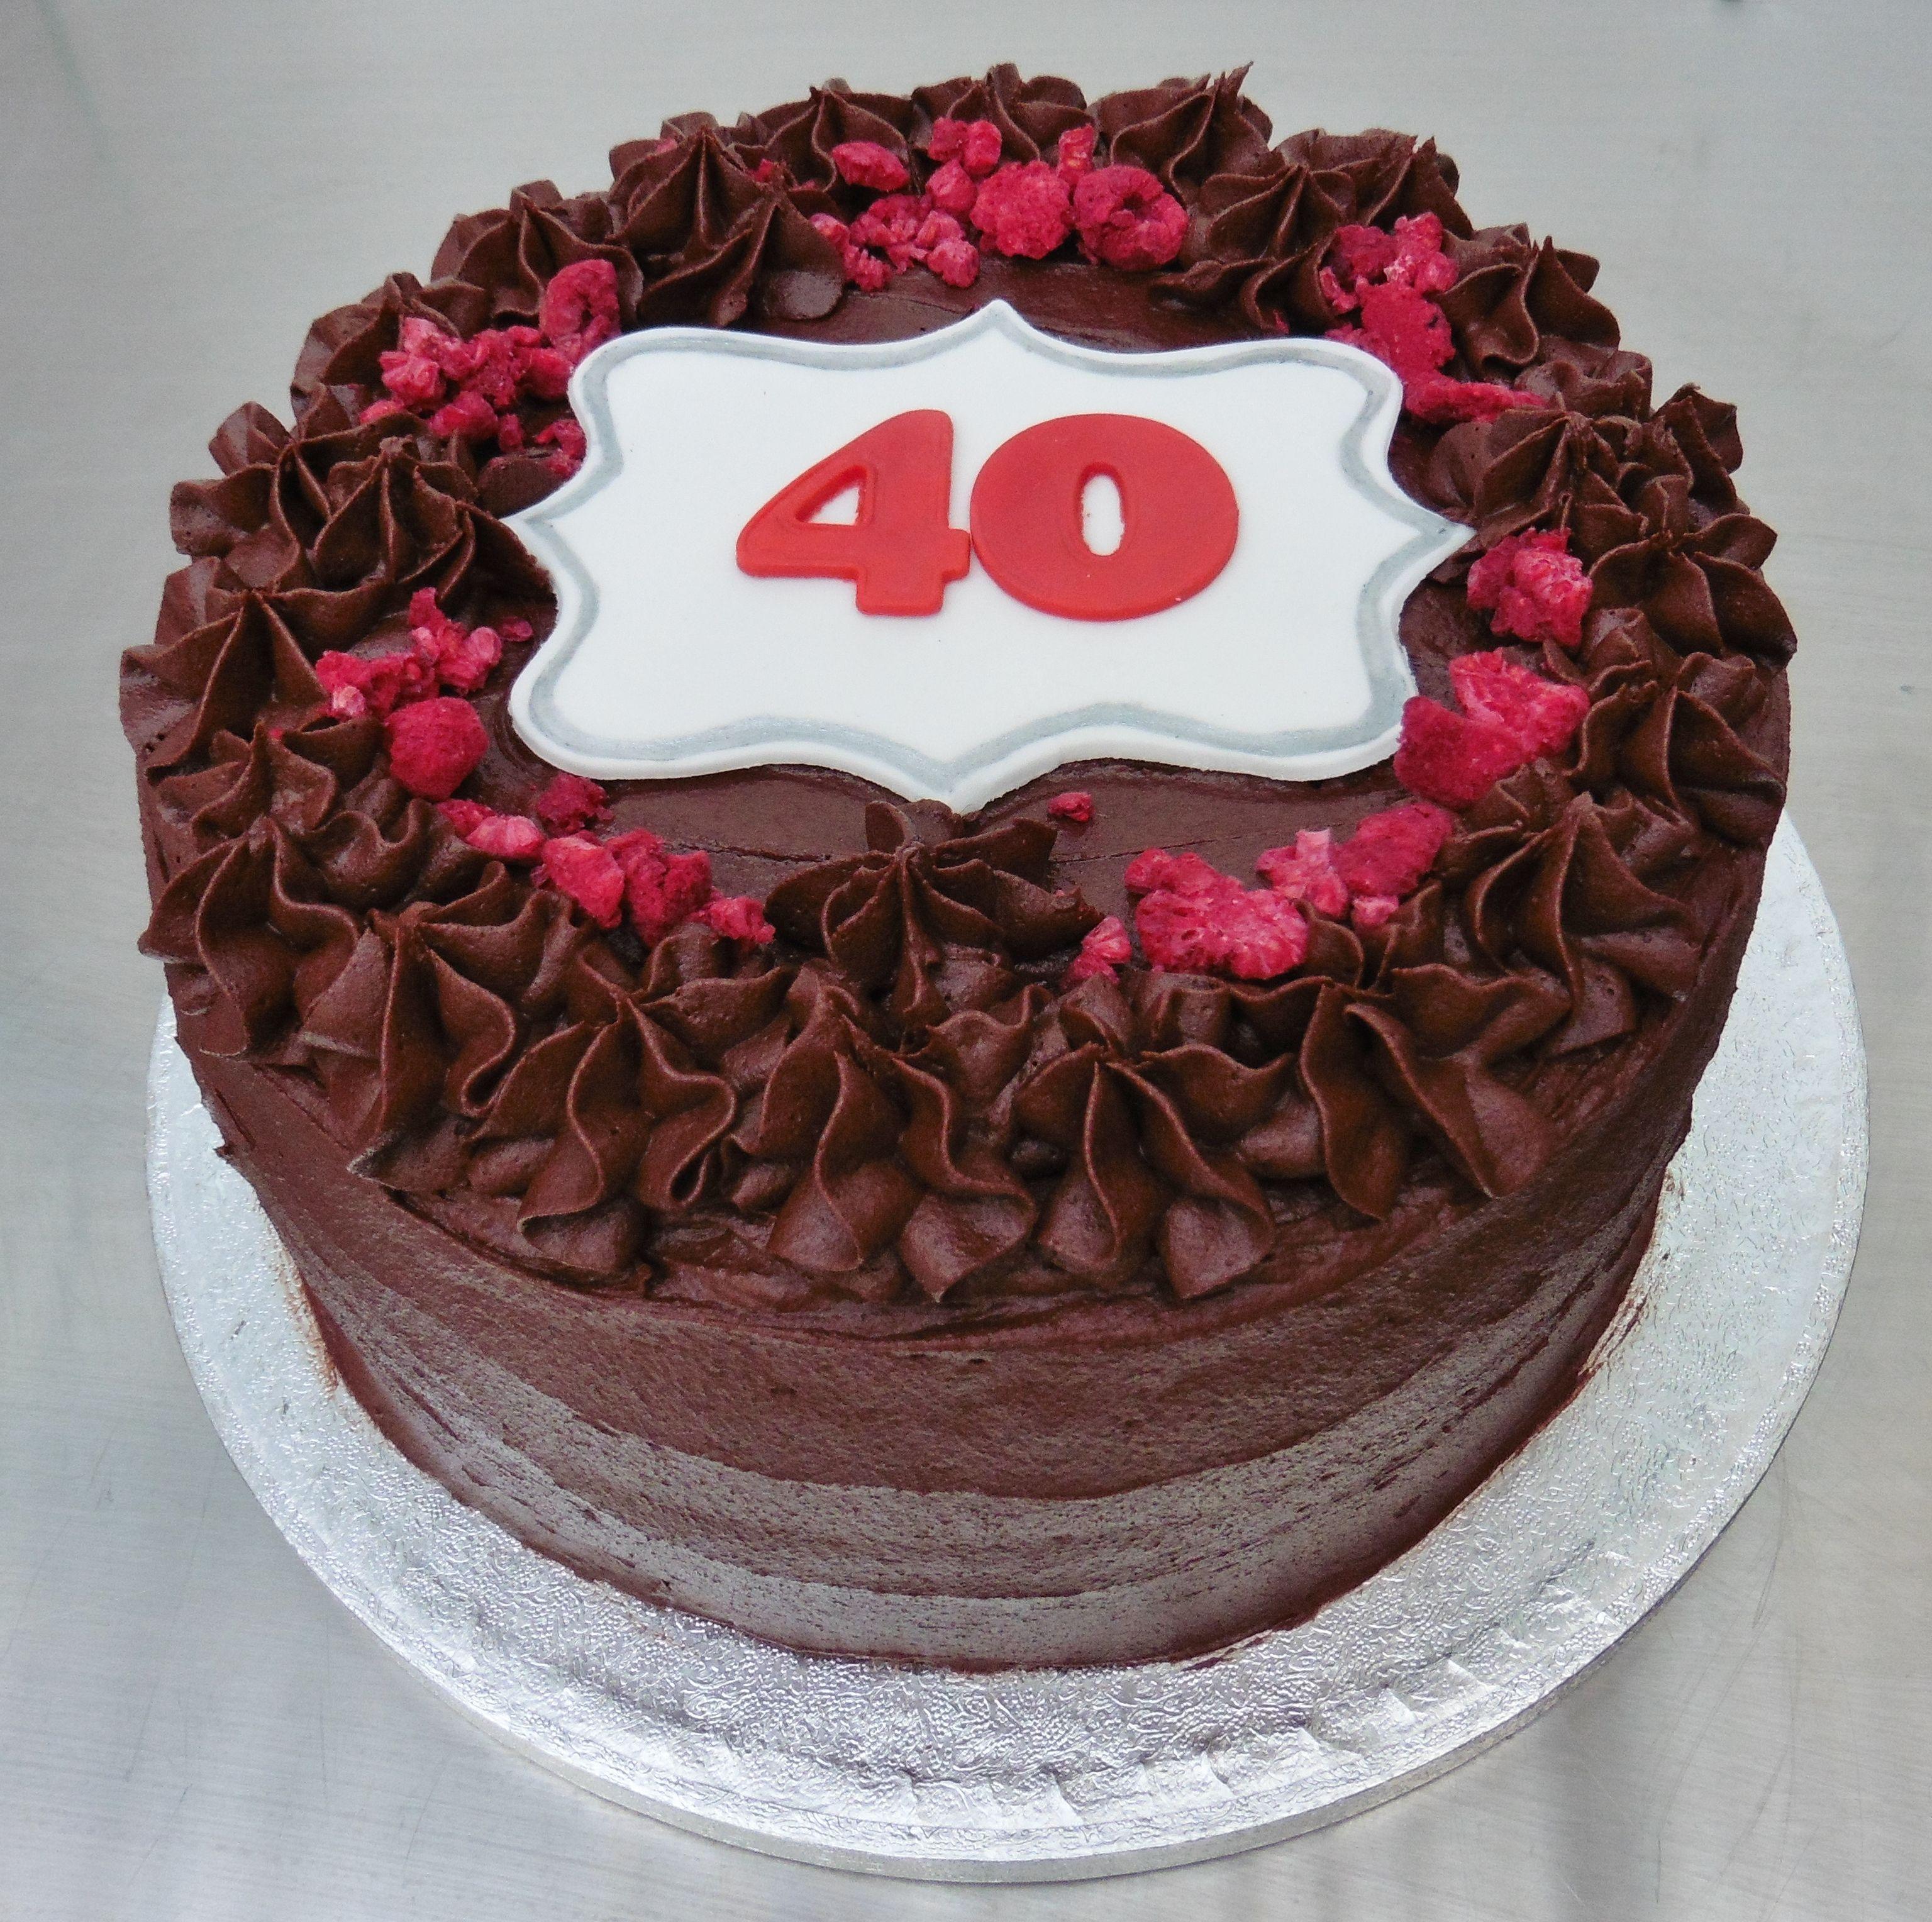 Tremendous Vegan Chocolate Raspberry Birthday Cake Freezedriedraspberries Personalised Birthday Cards Arneslily Jamesorg